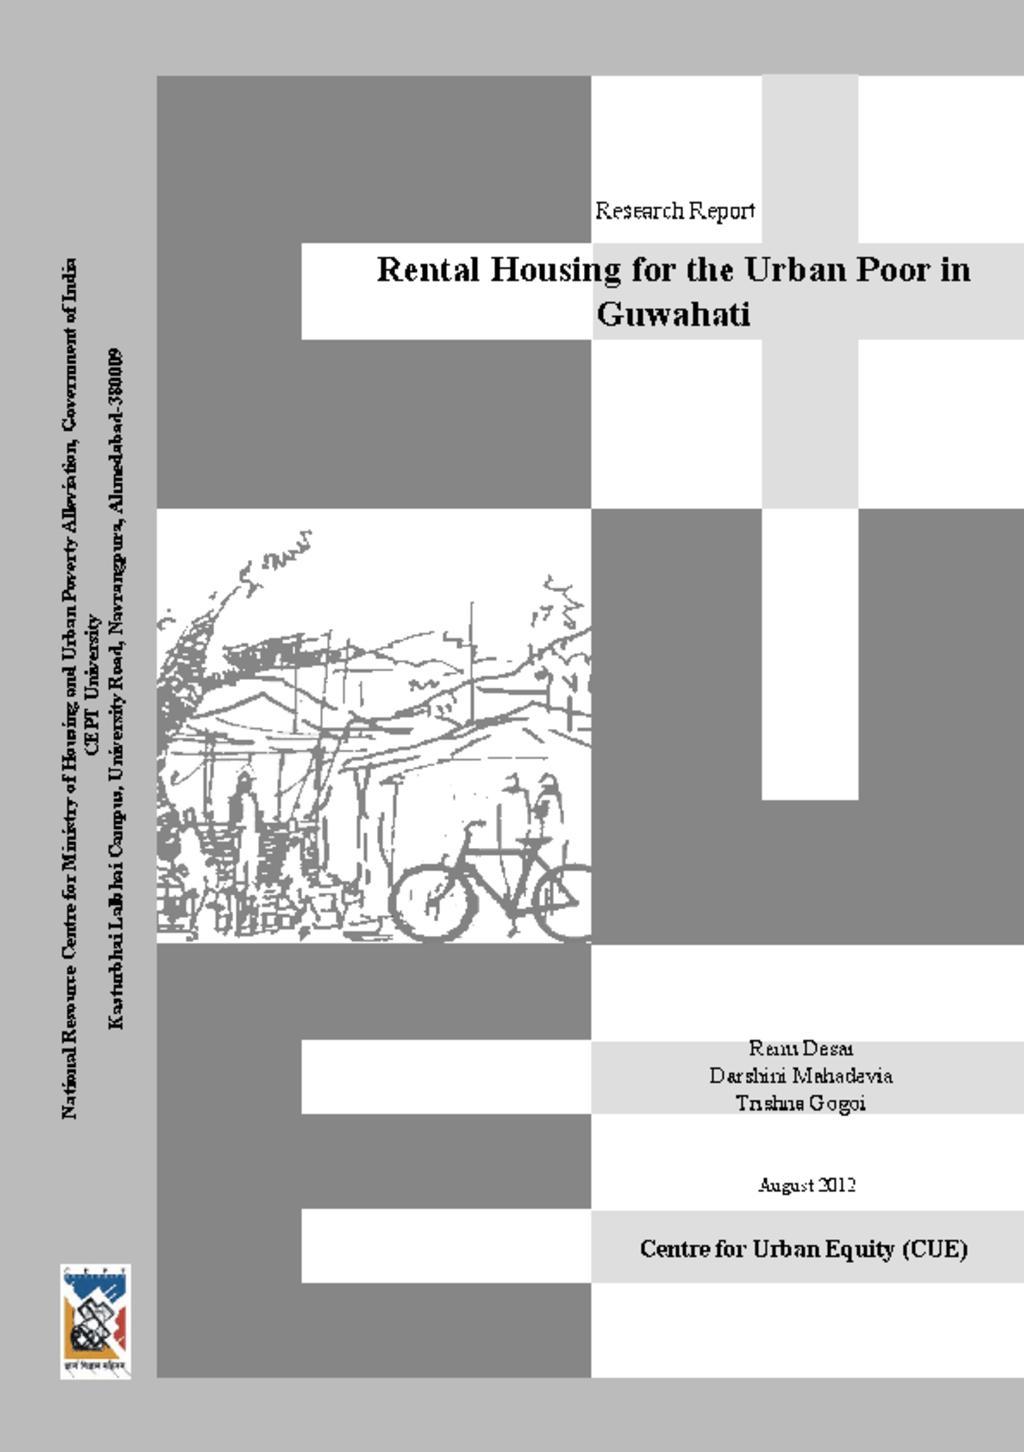 Rental Housing Report